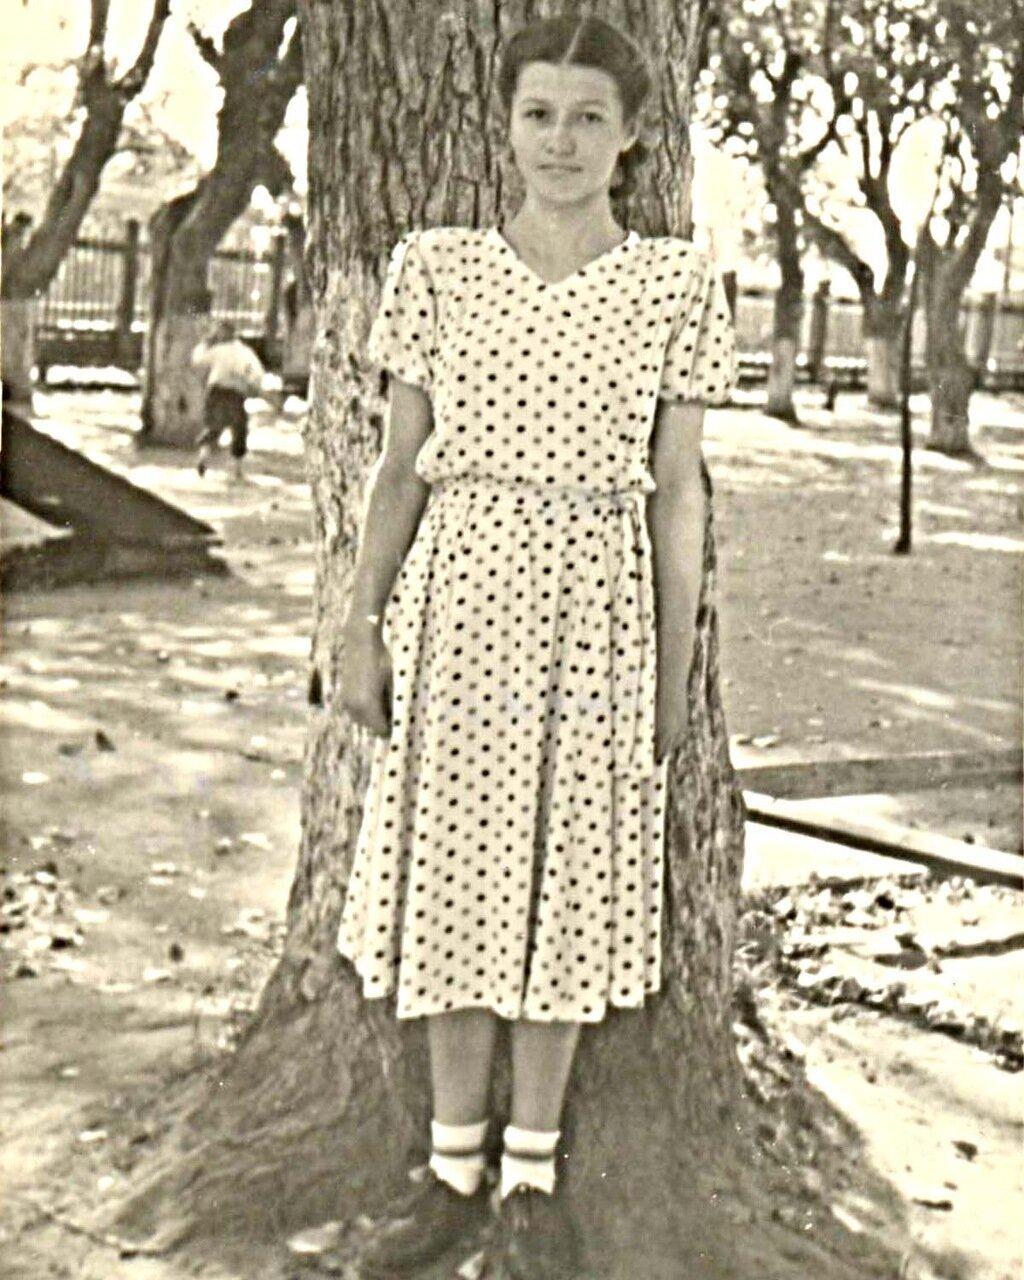 30. Башурина Ю. в 1955 году